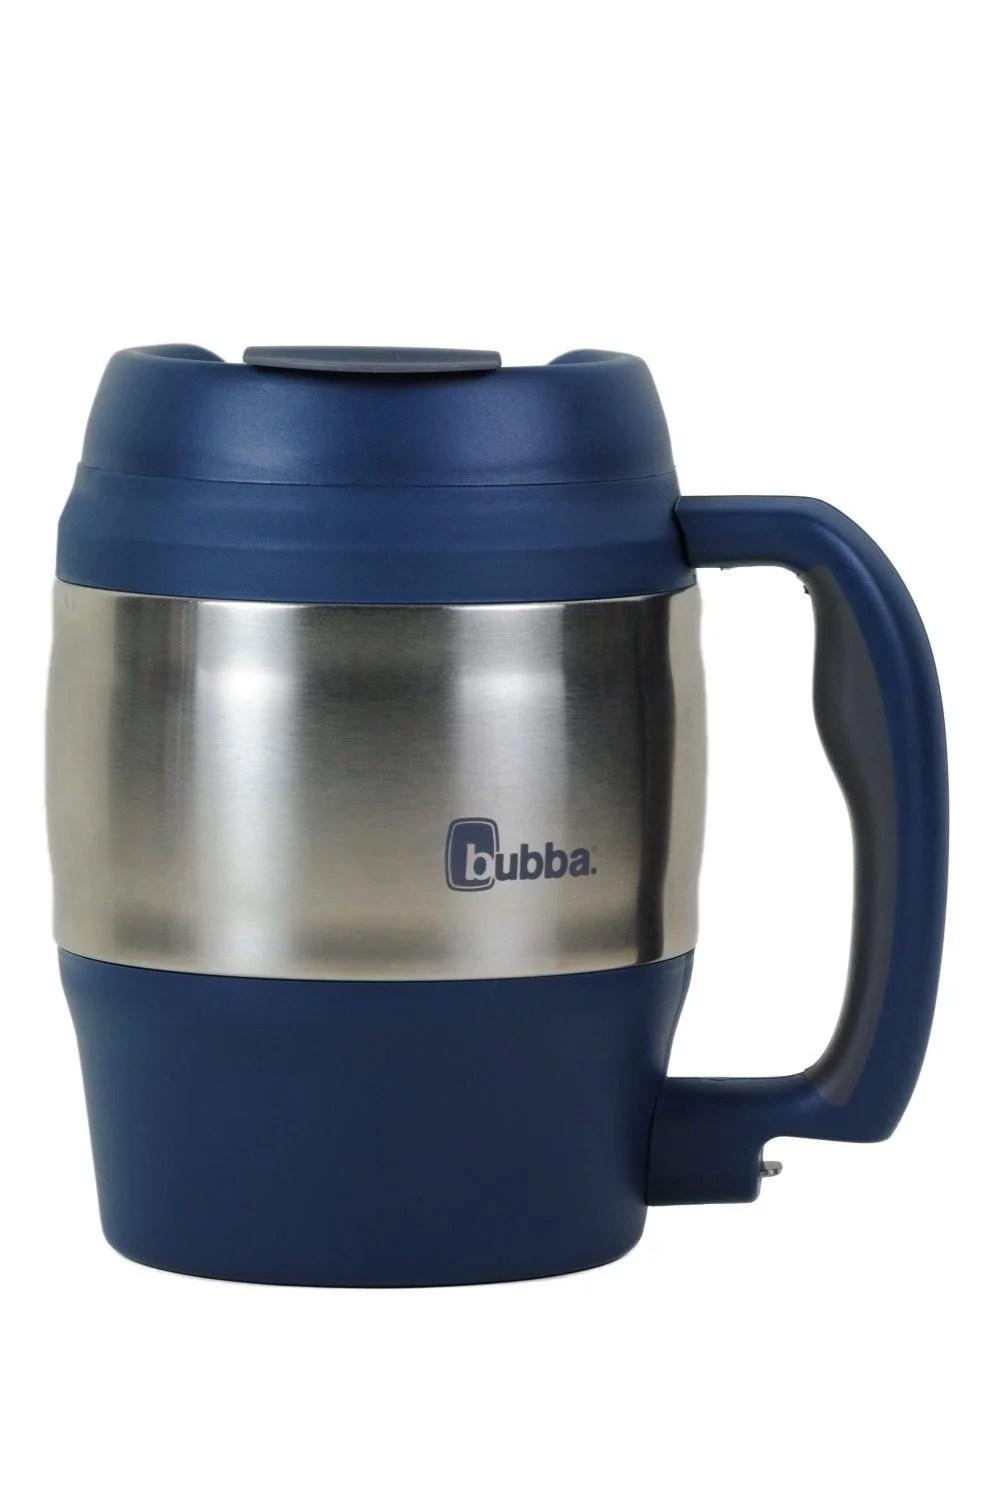 Bubba 34